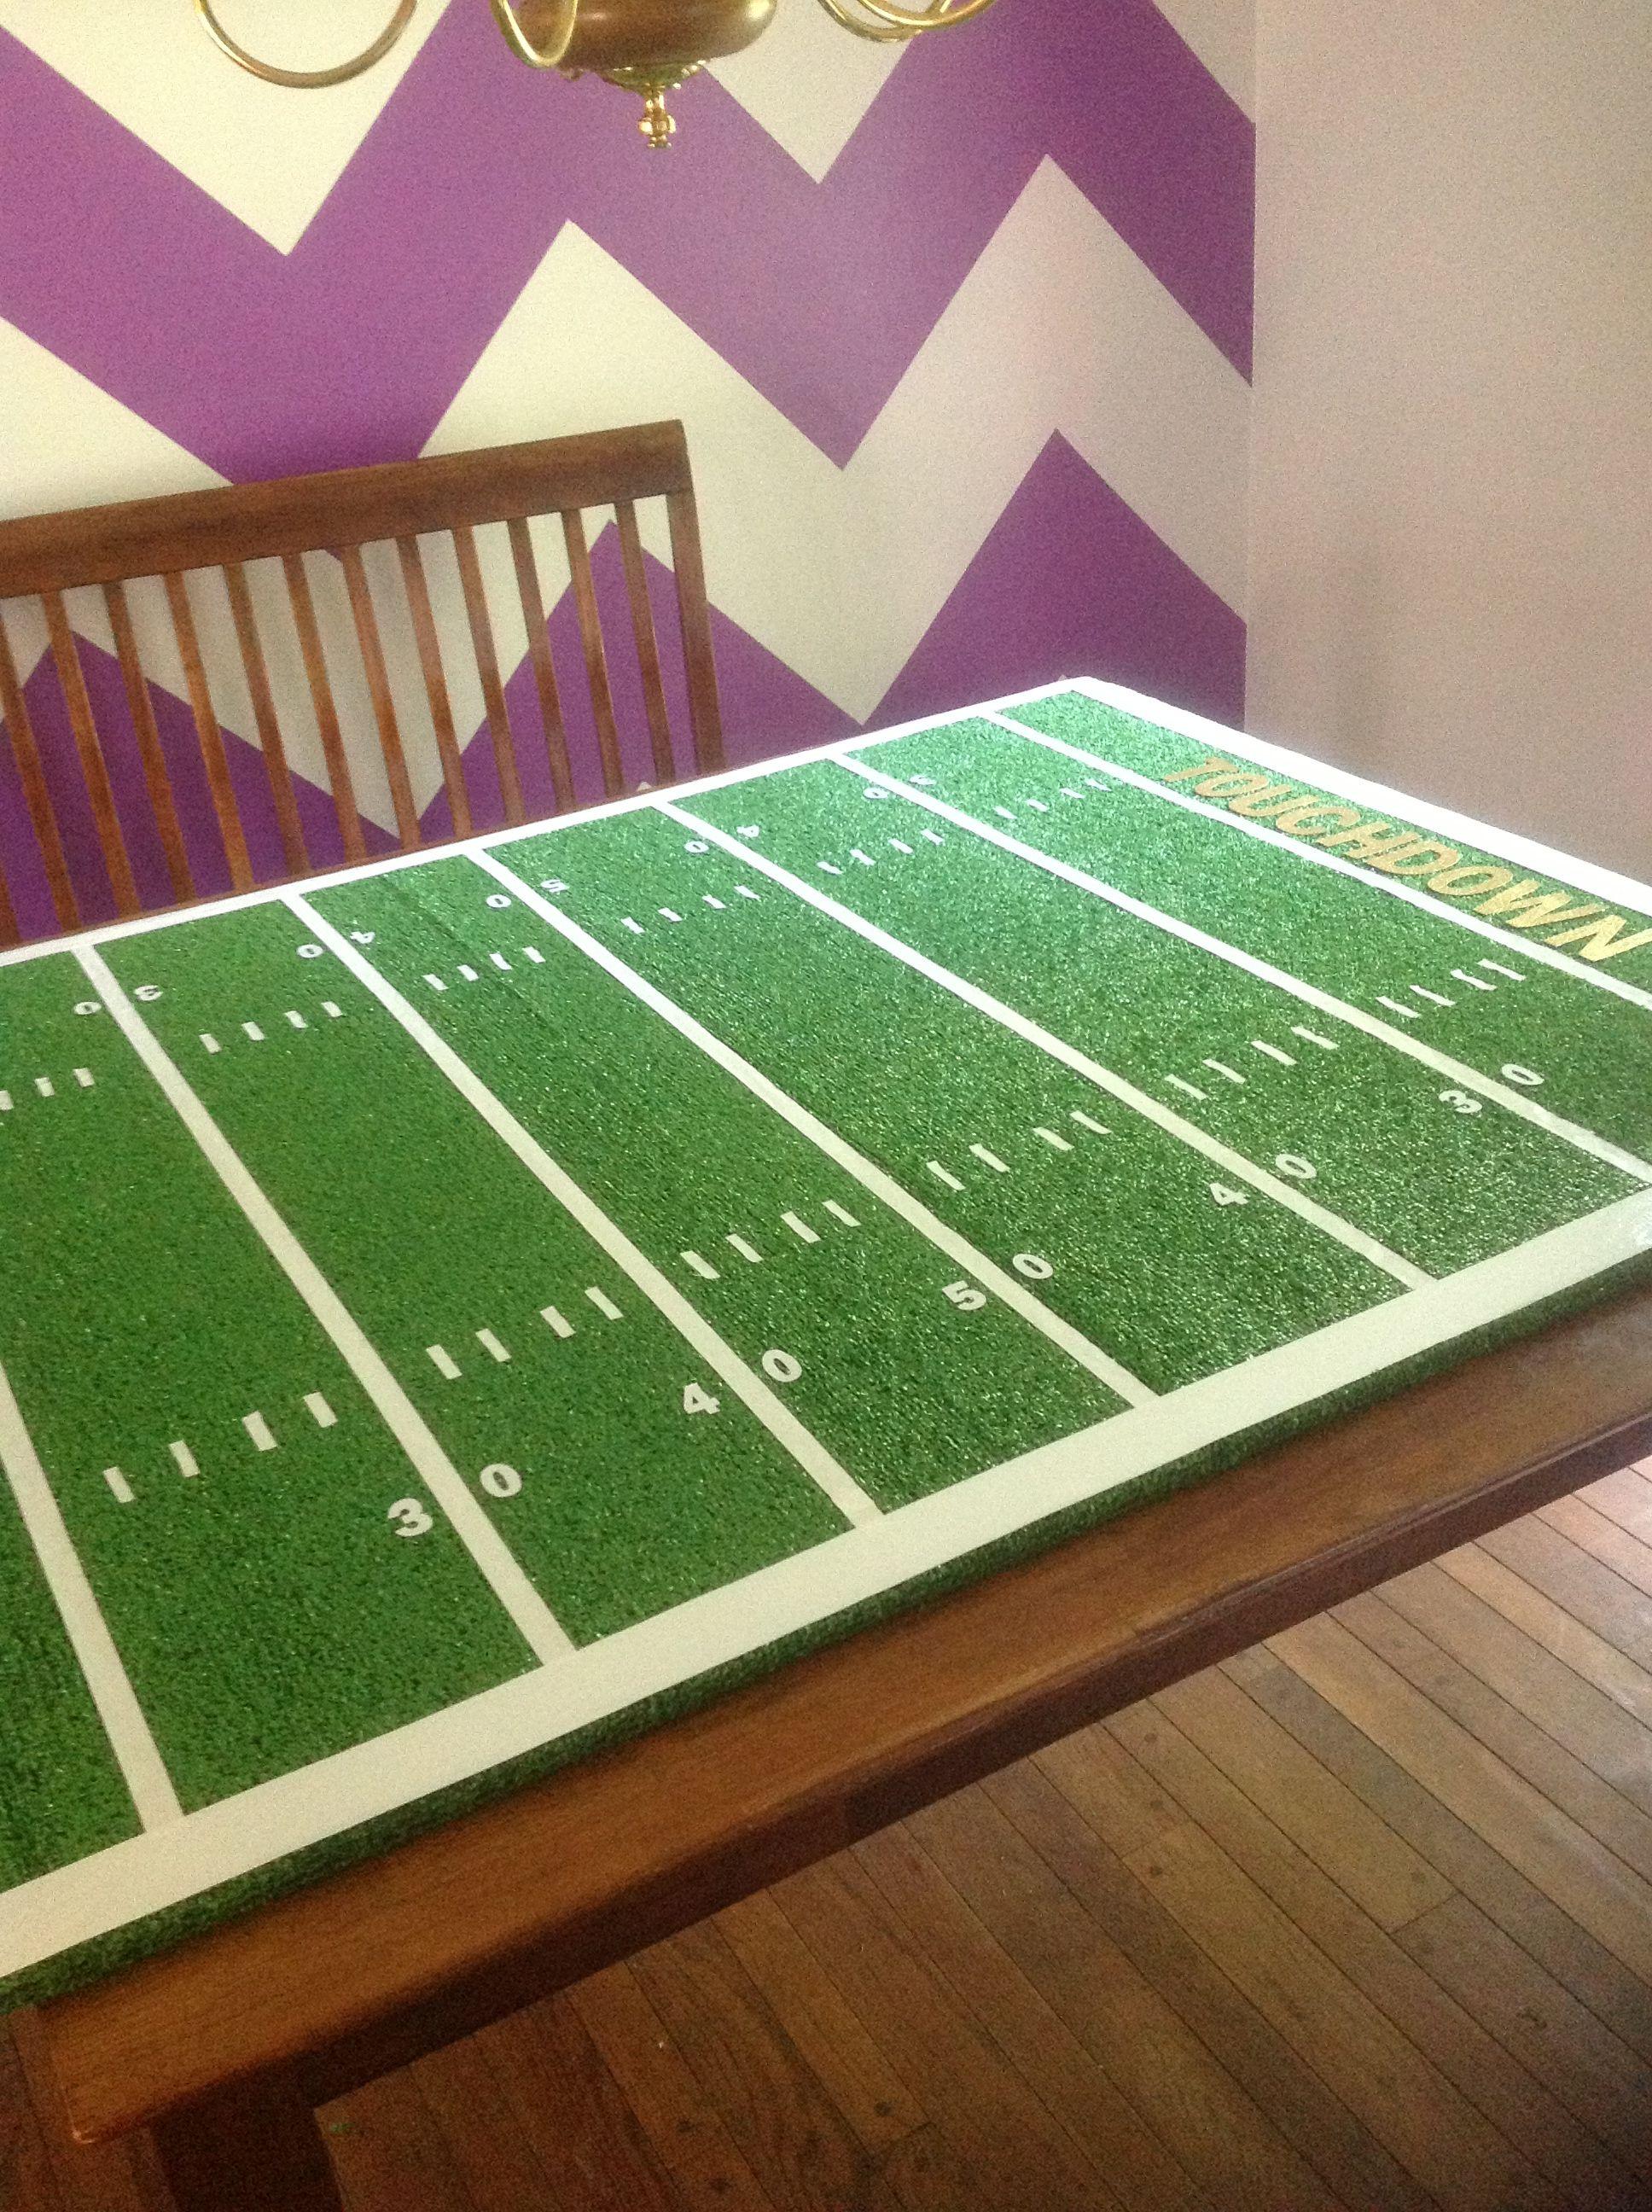 Football Field Decoration Ideas